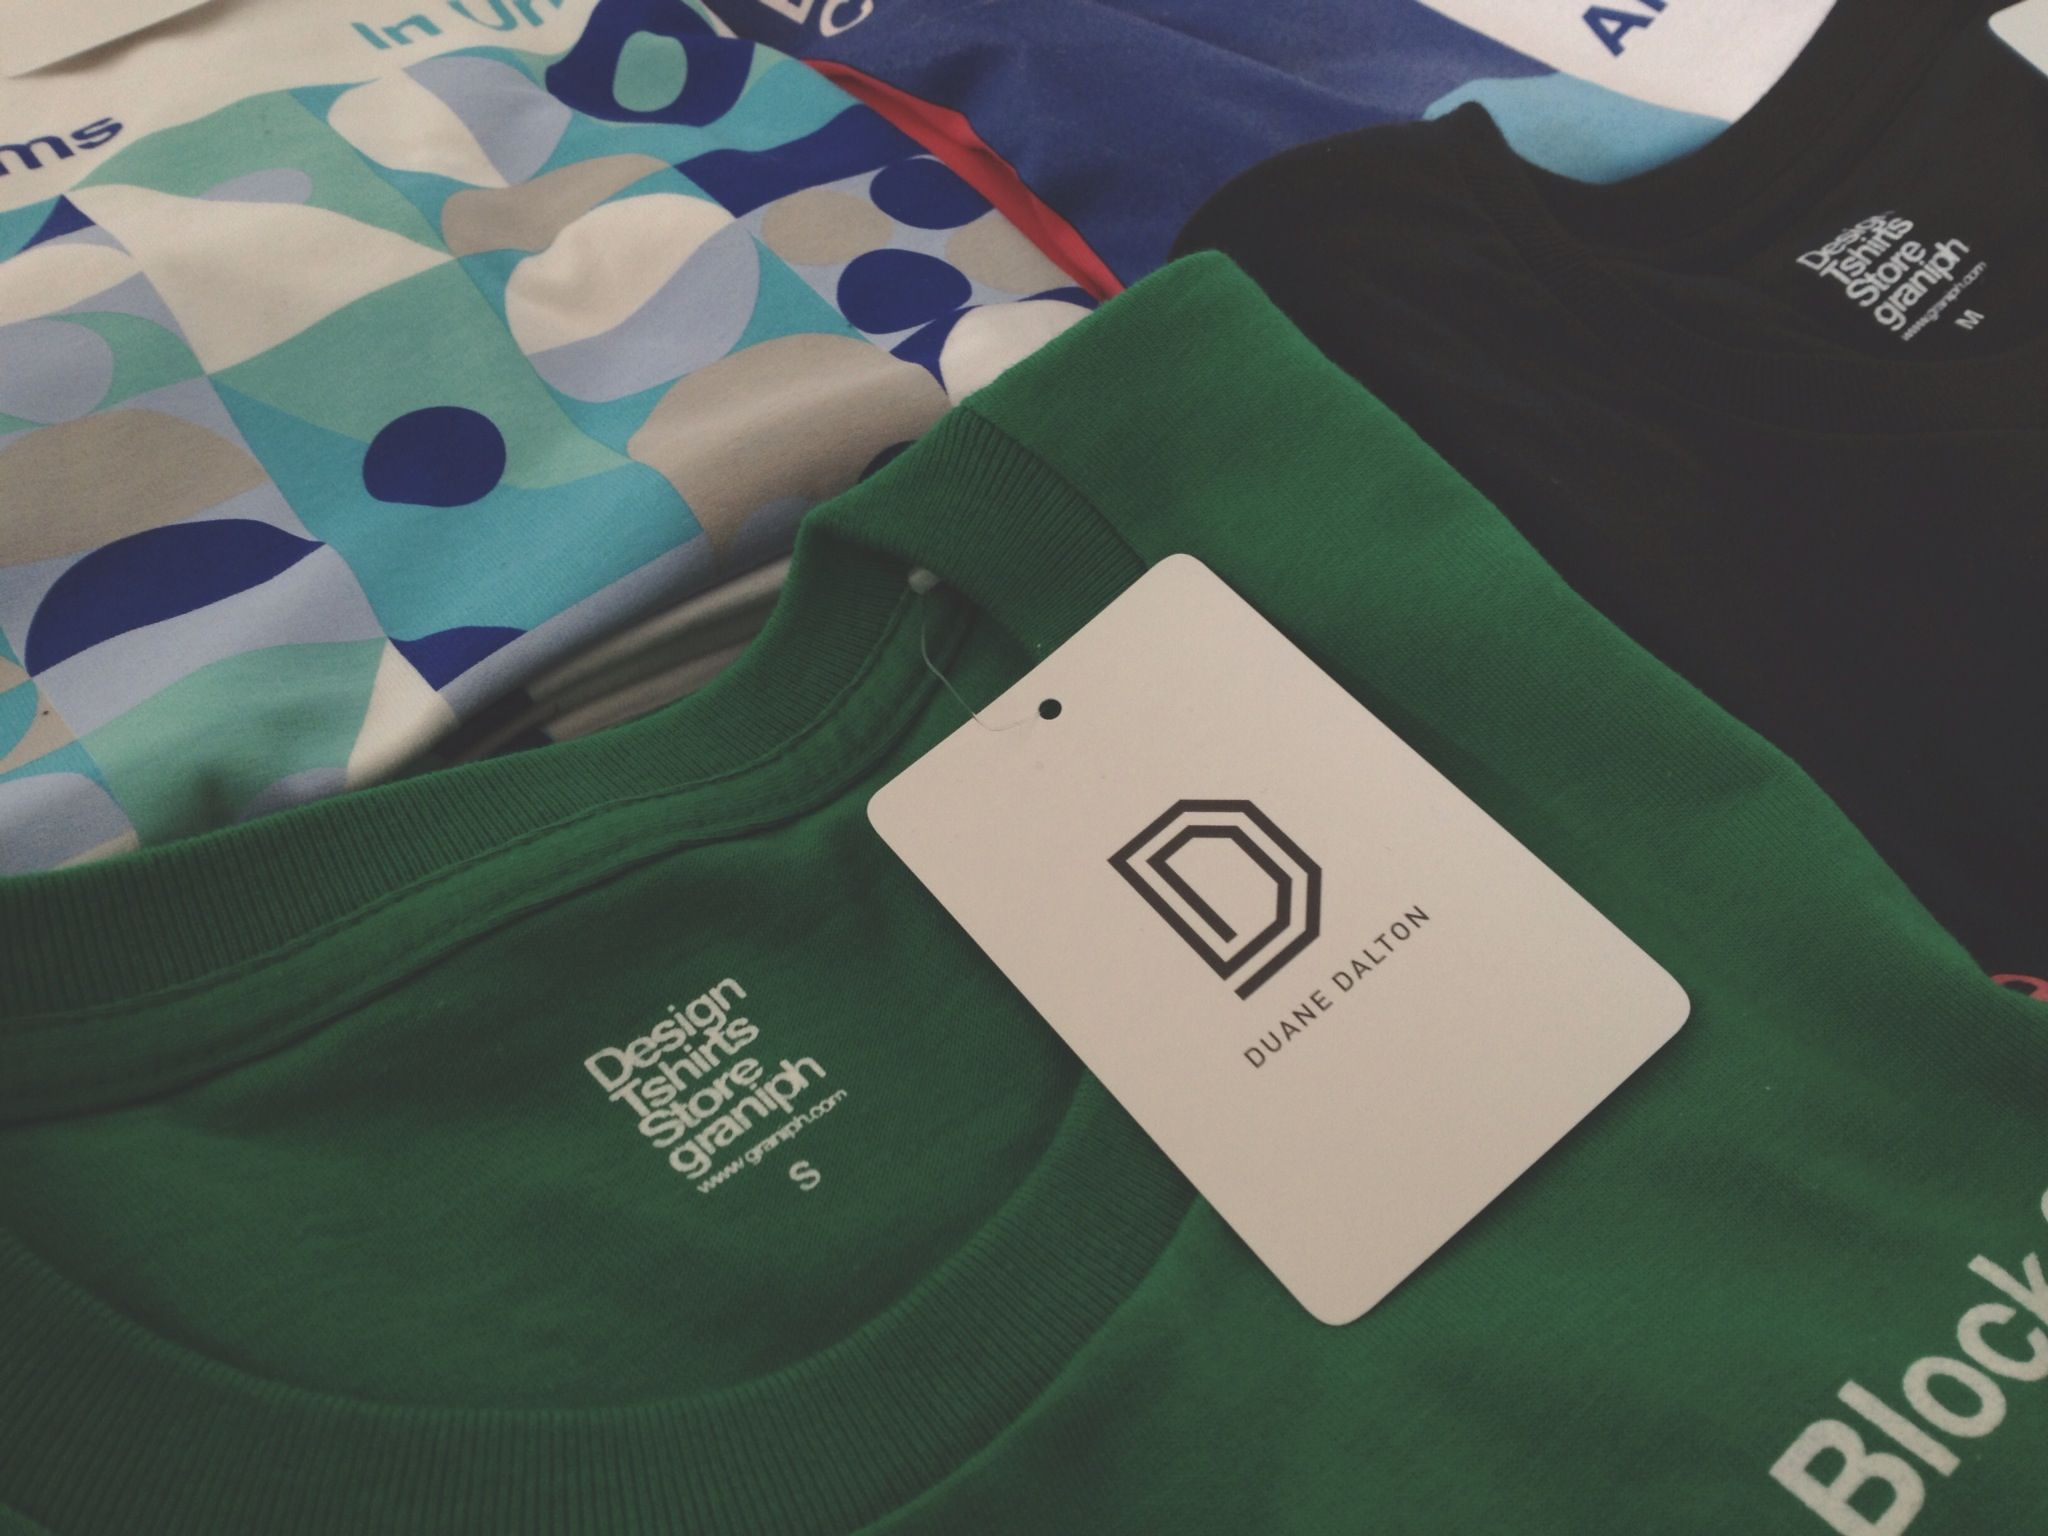 Design t shirt label - Design T Shirt Label 54